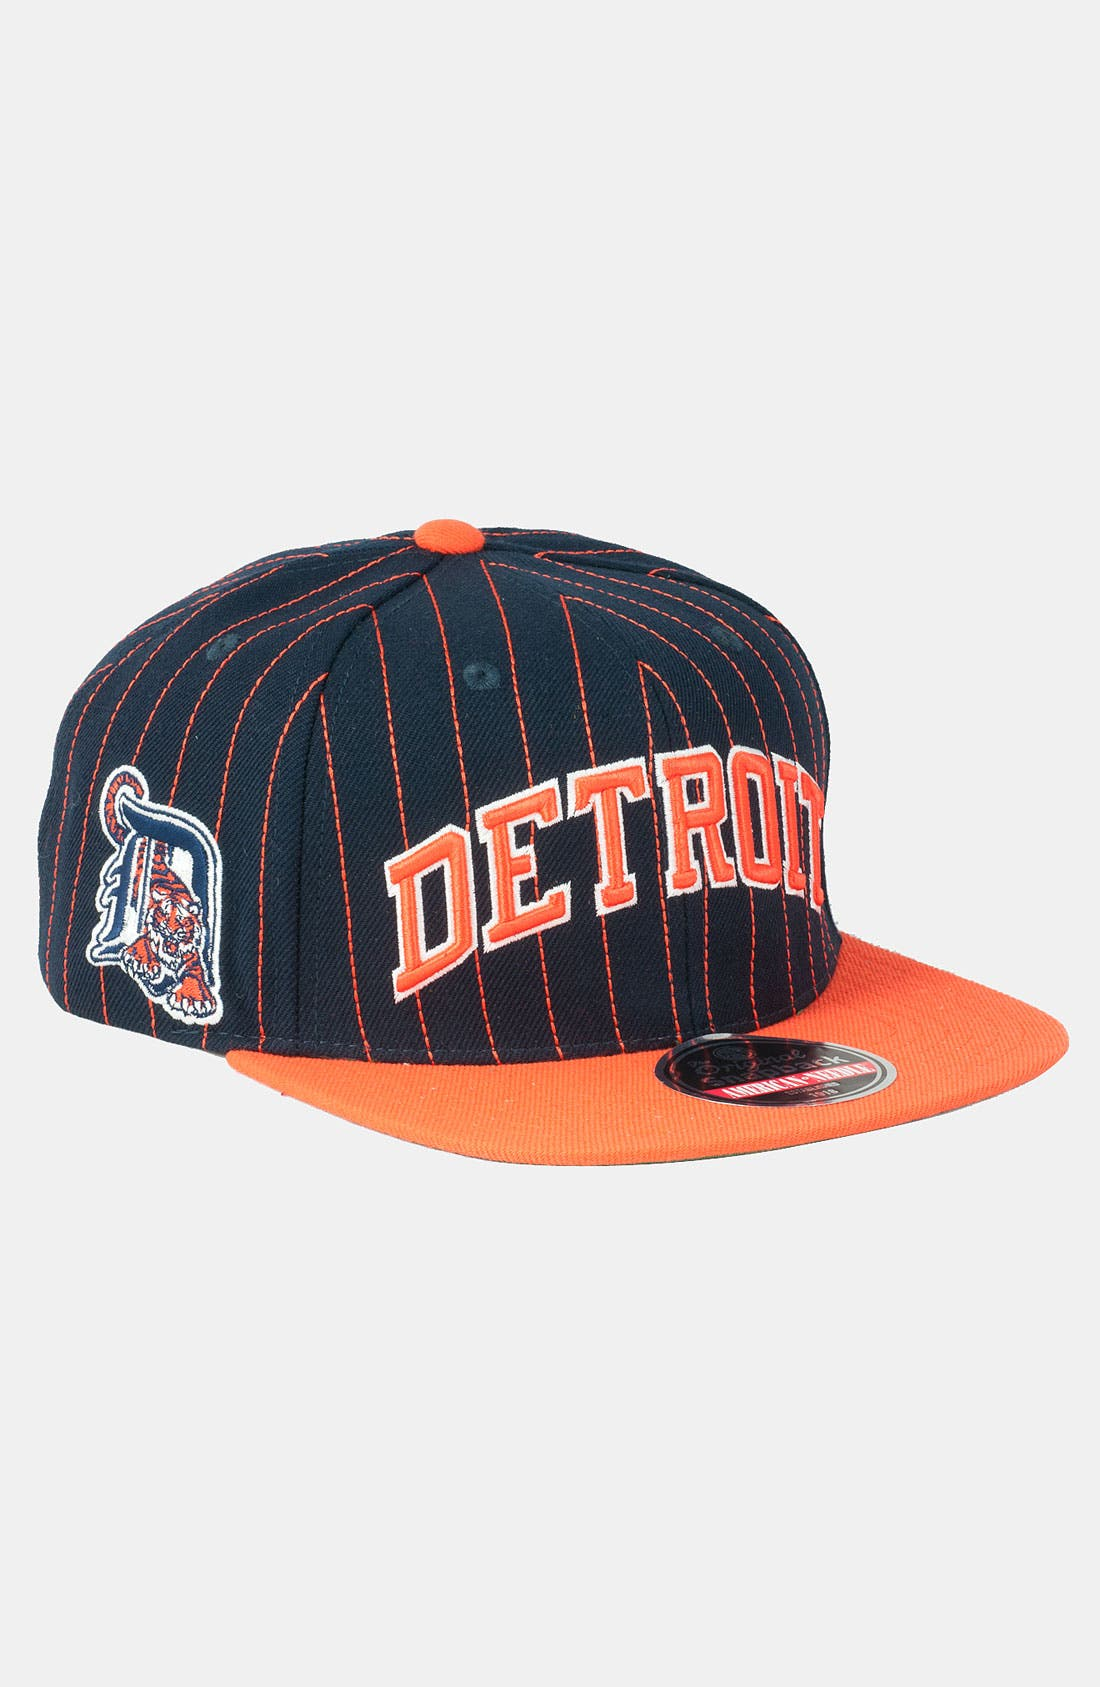 Alternate Image 1 Selected - American Needle 'Tigers' Snapback Baseball Cap